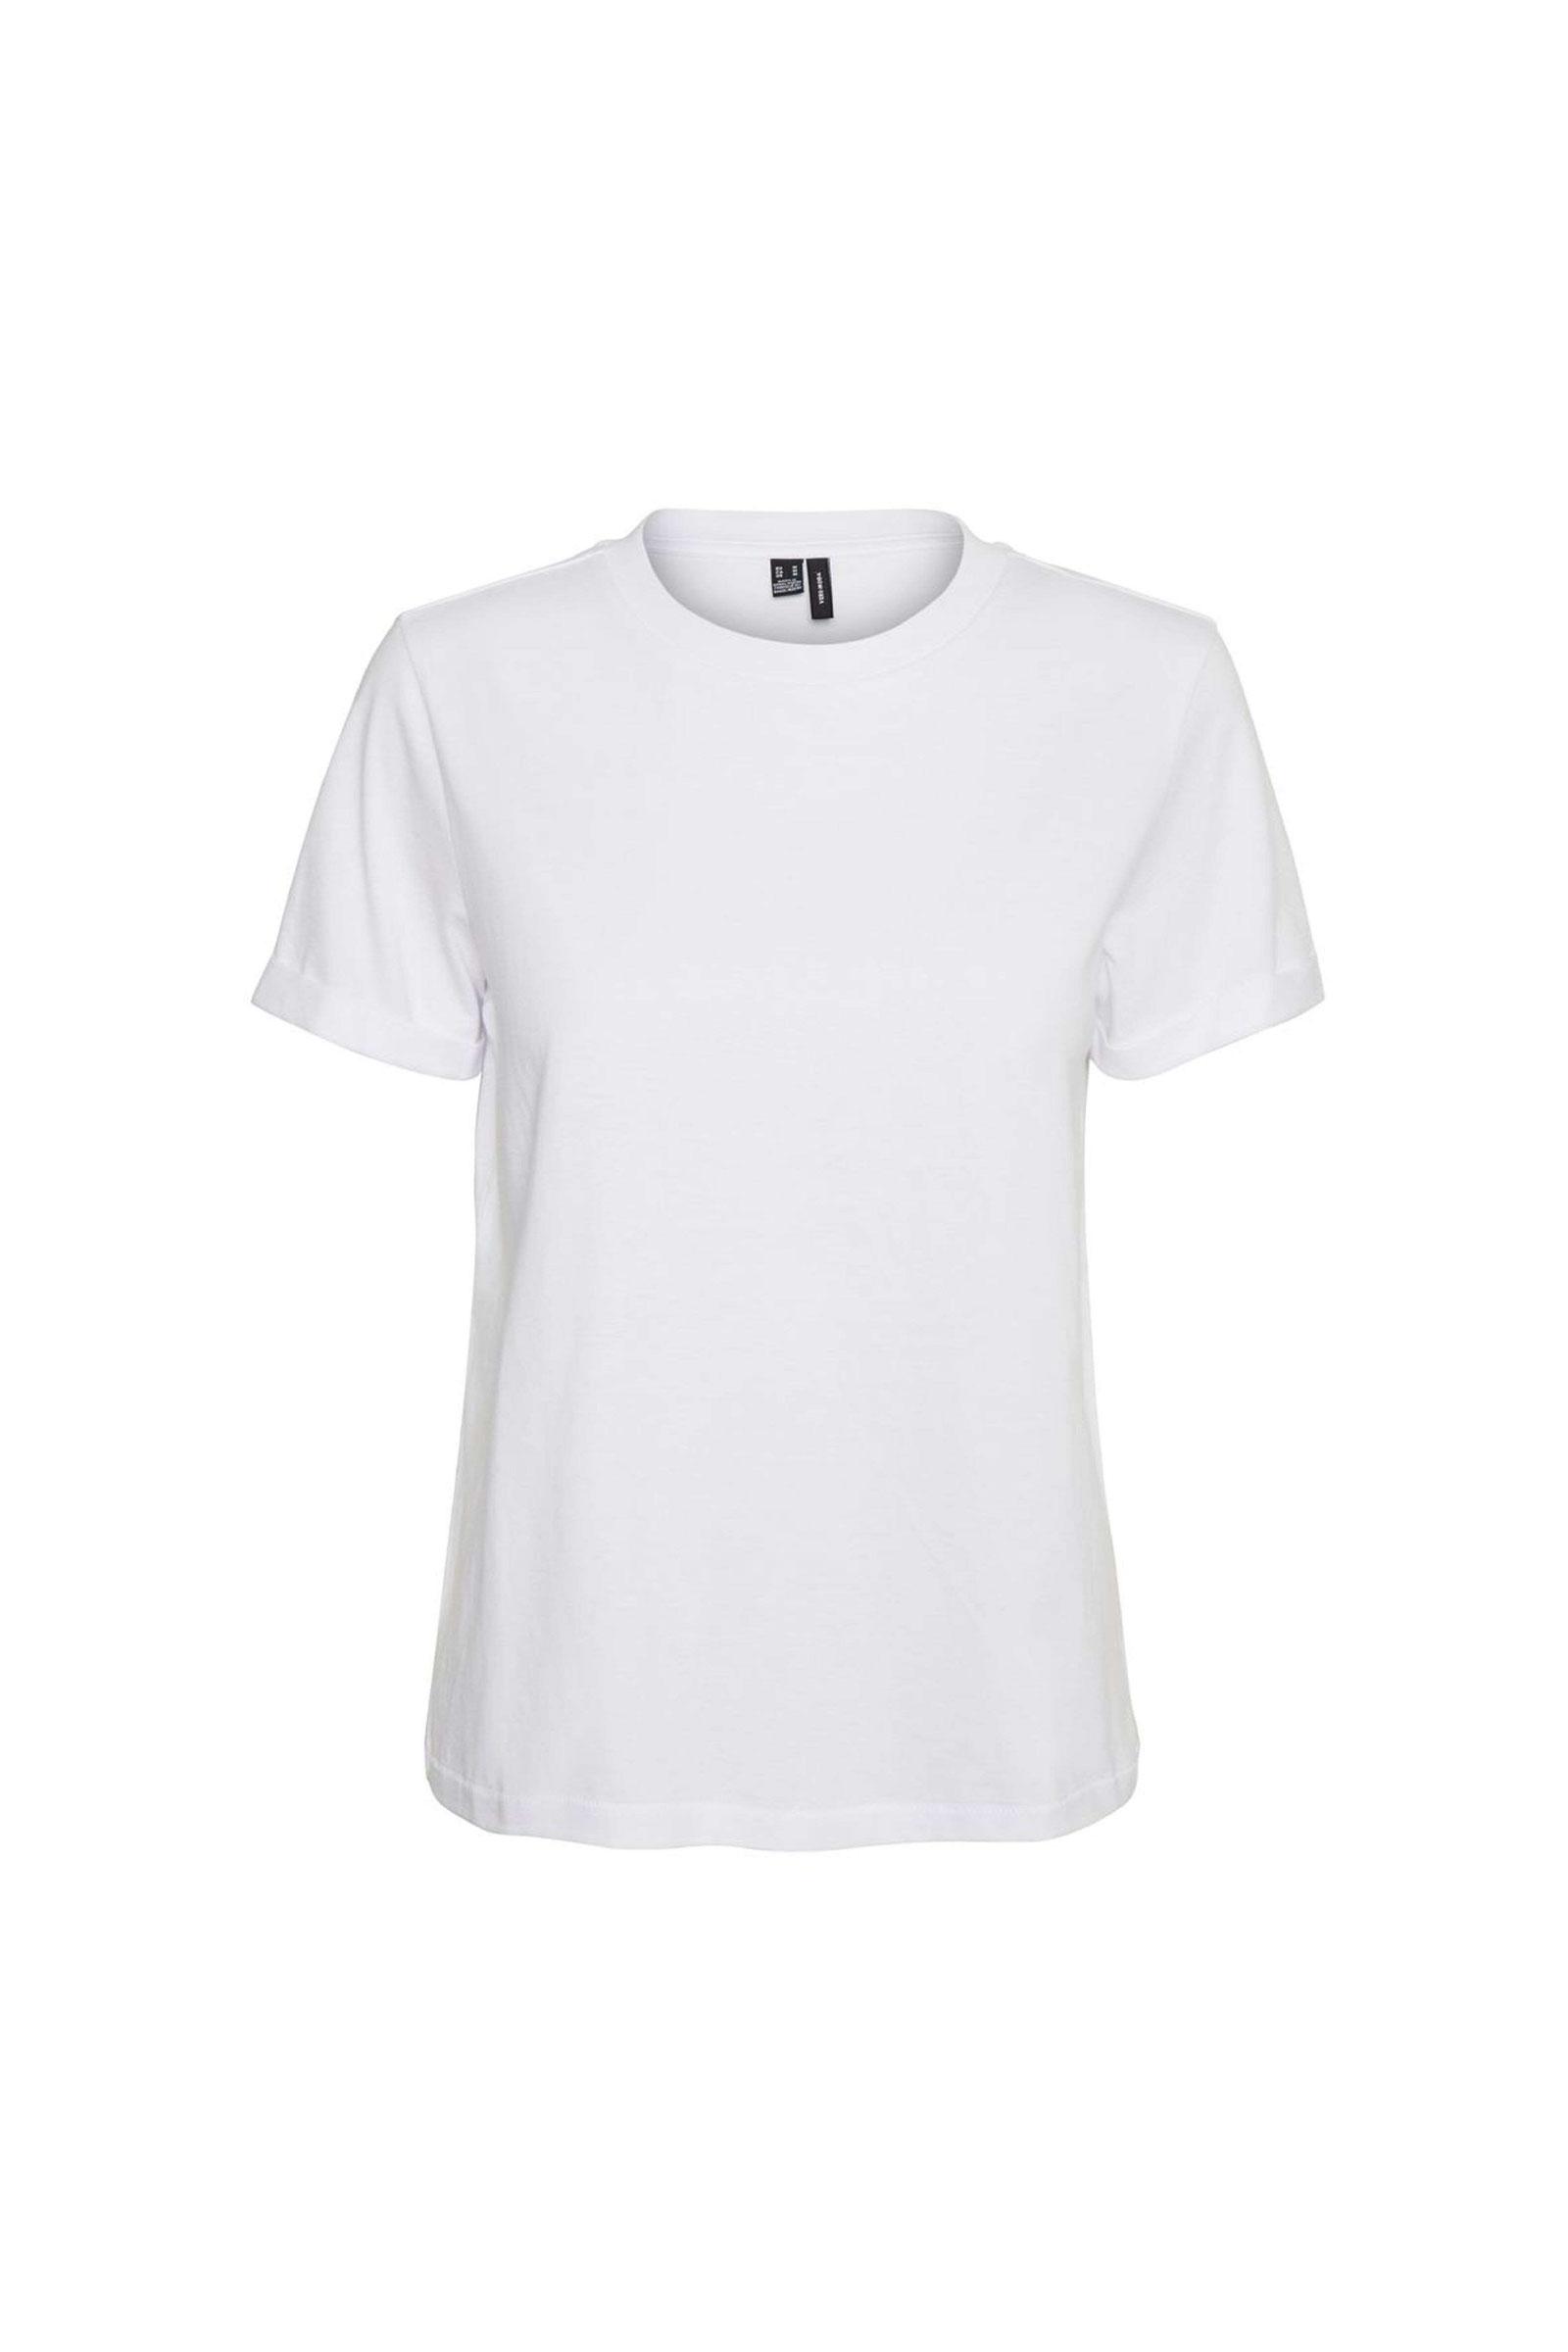 VERO MODA Women's T-Shirt VERO MODA | T-Shirt | 10243889Bright White